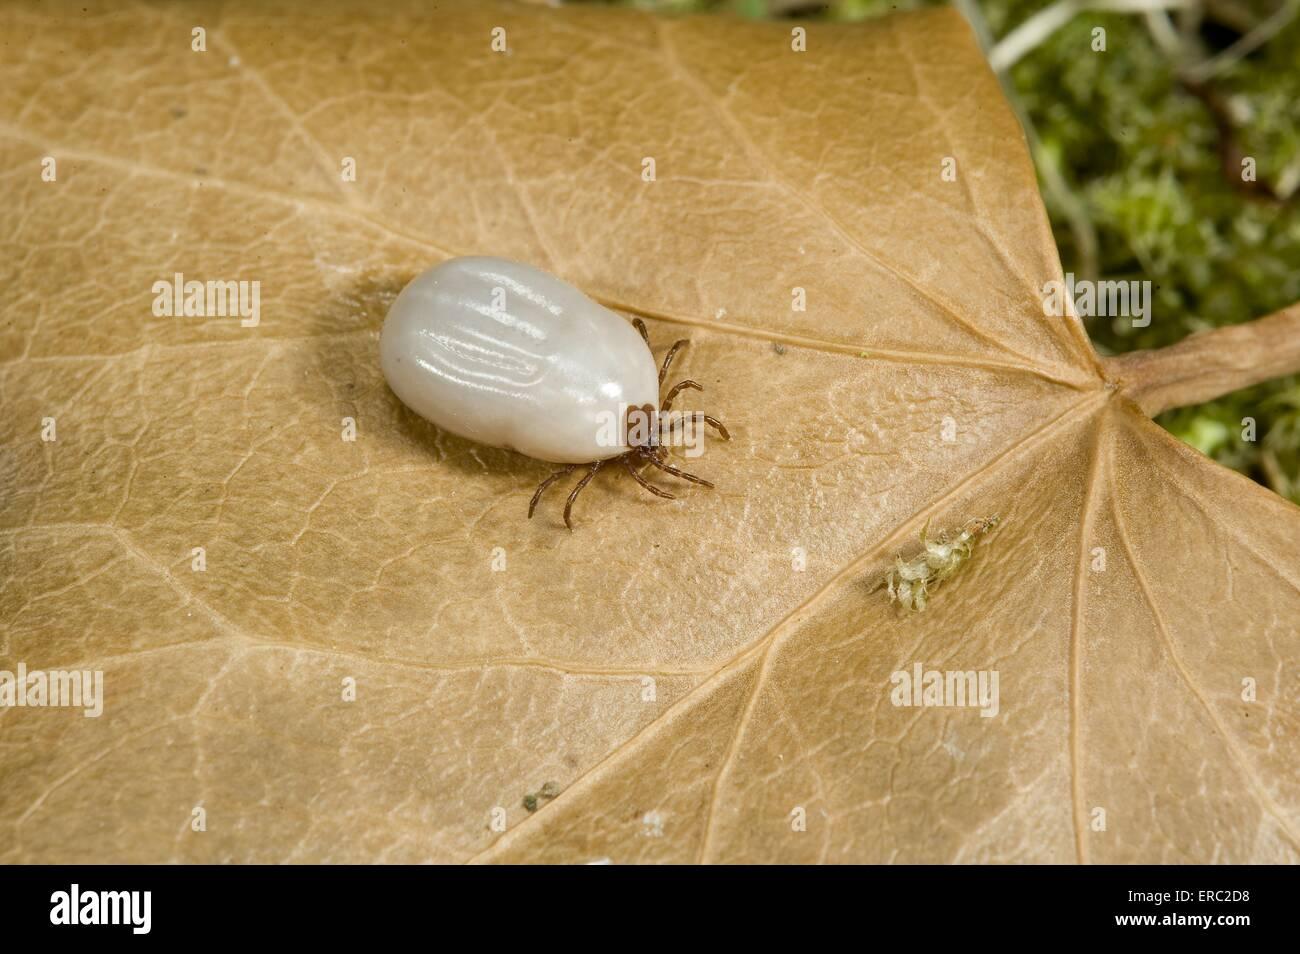 wood tick - Stock Image